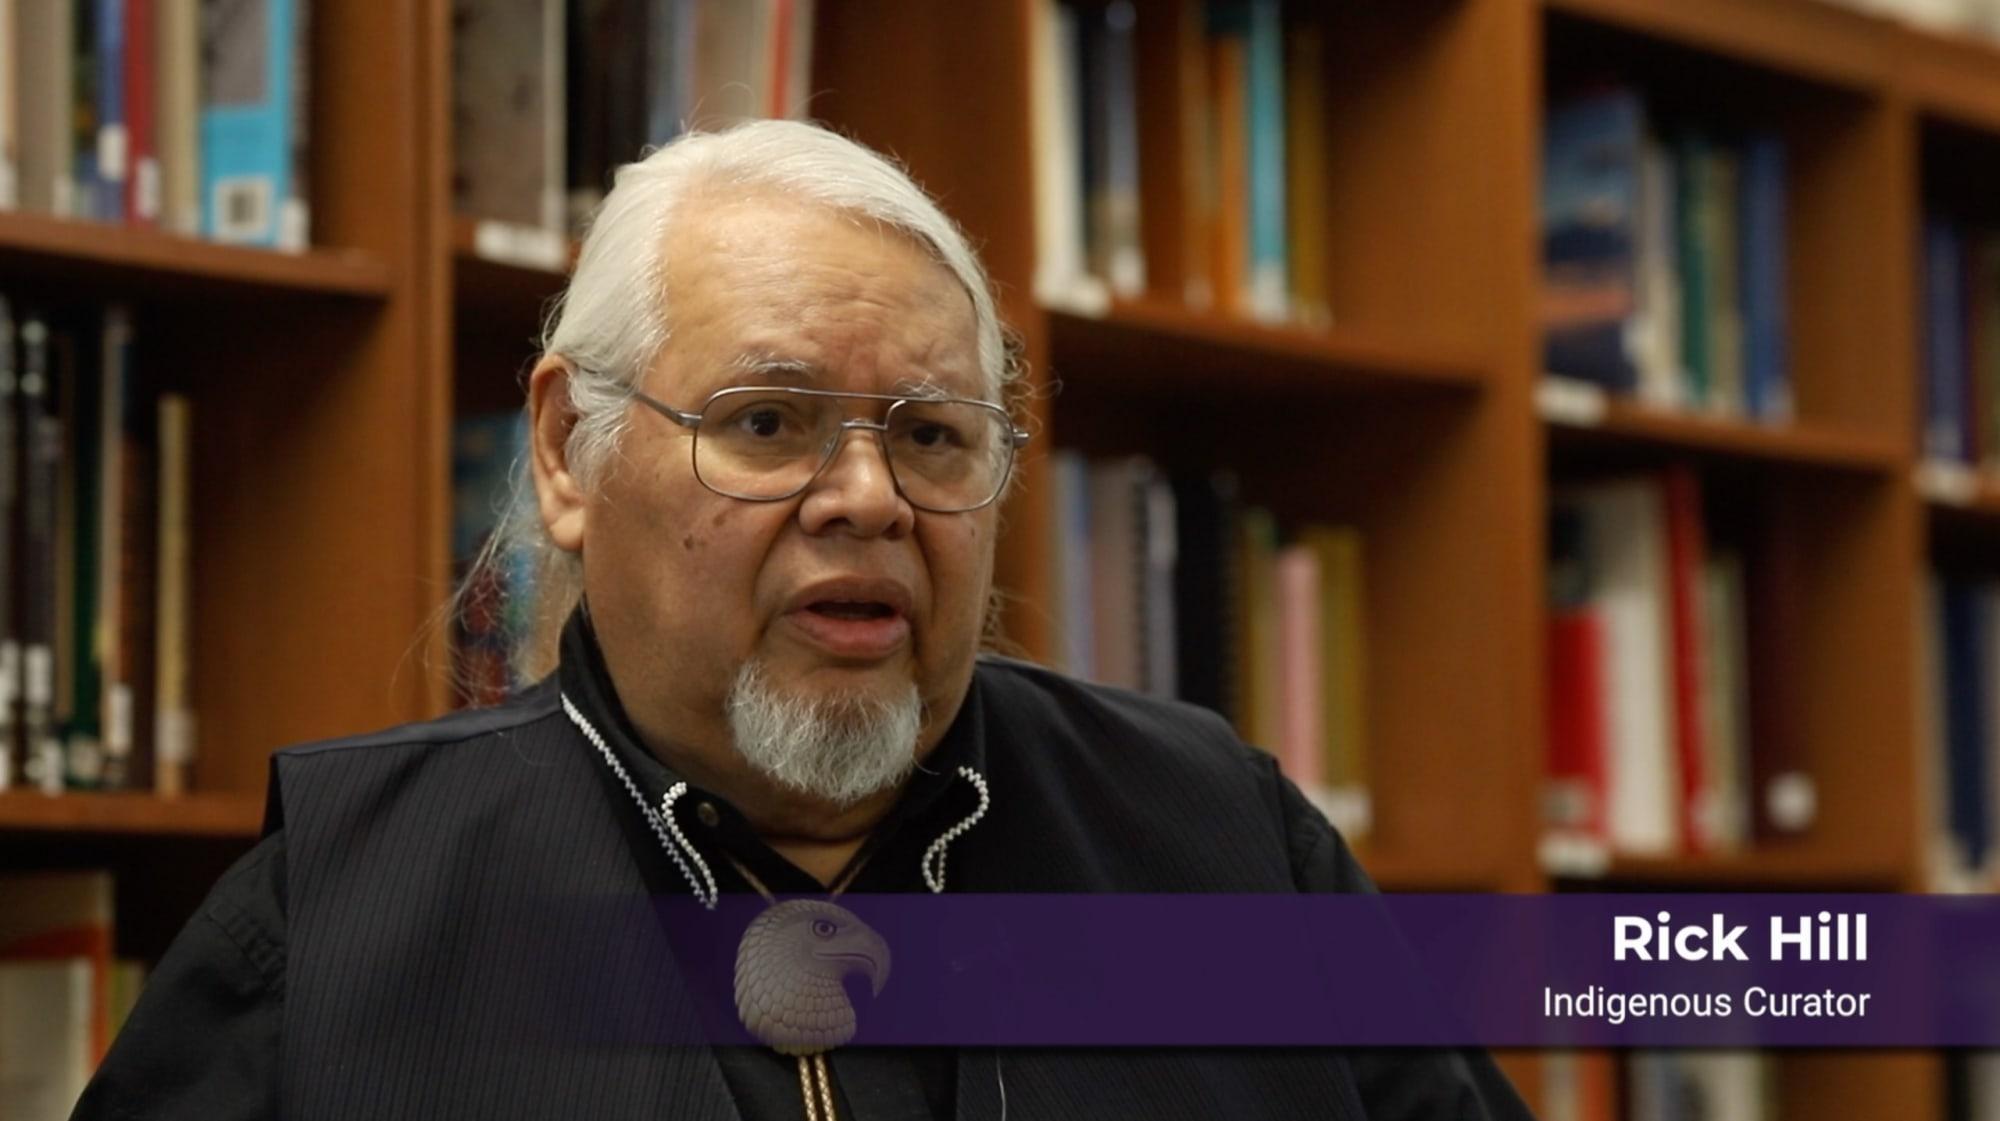 Rick Hill - Indigenous Curator